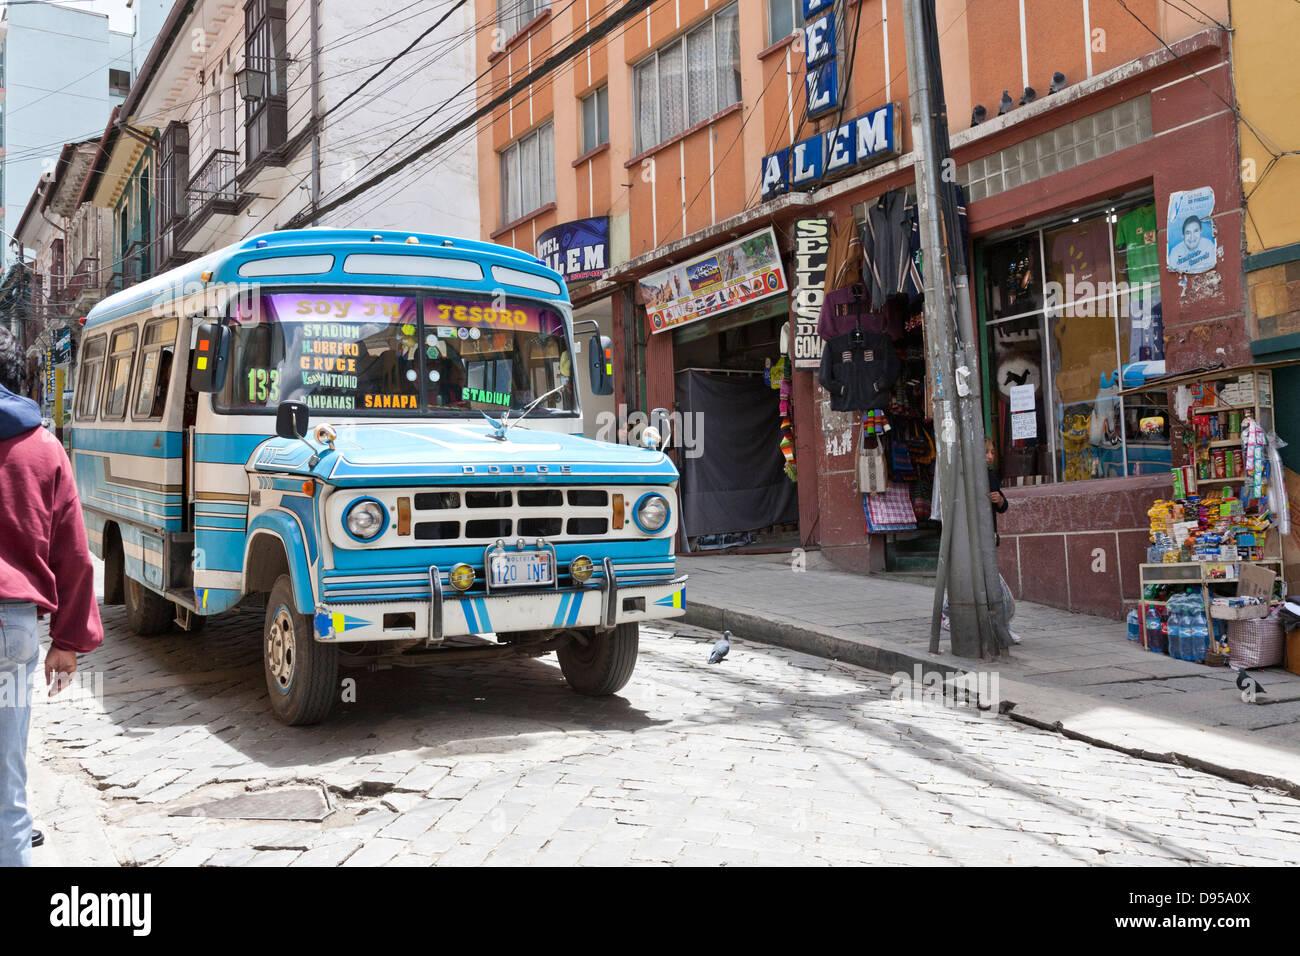 Bus, Public Transportation, La Paz, Bolivia - Stock Image